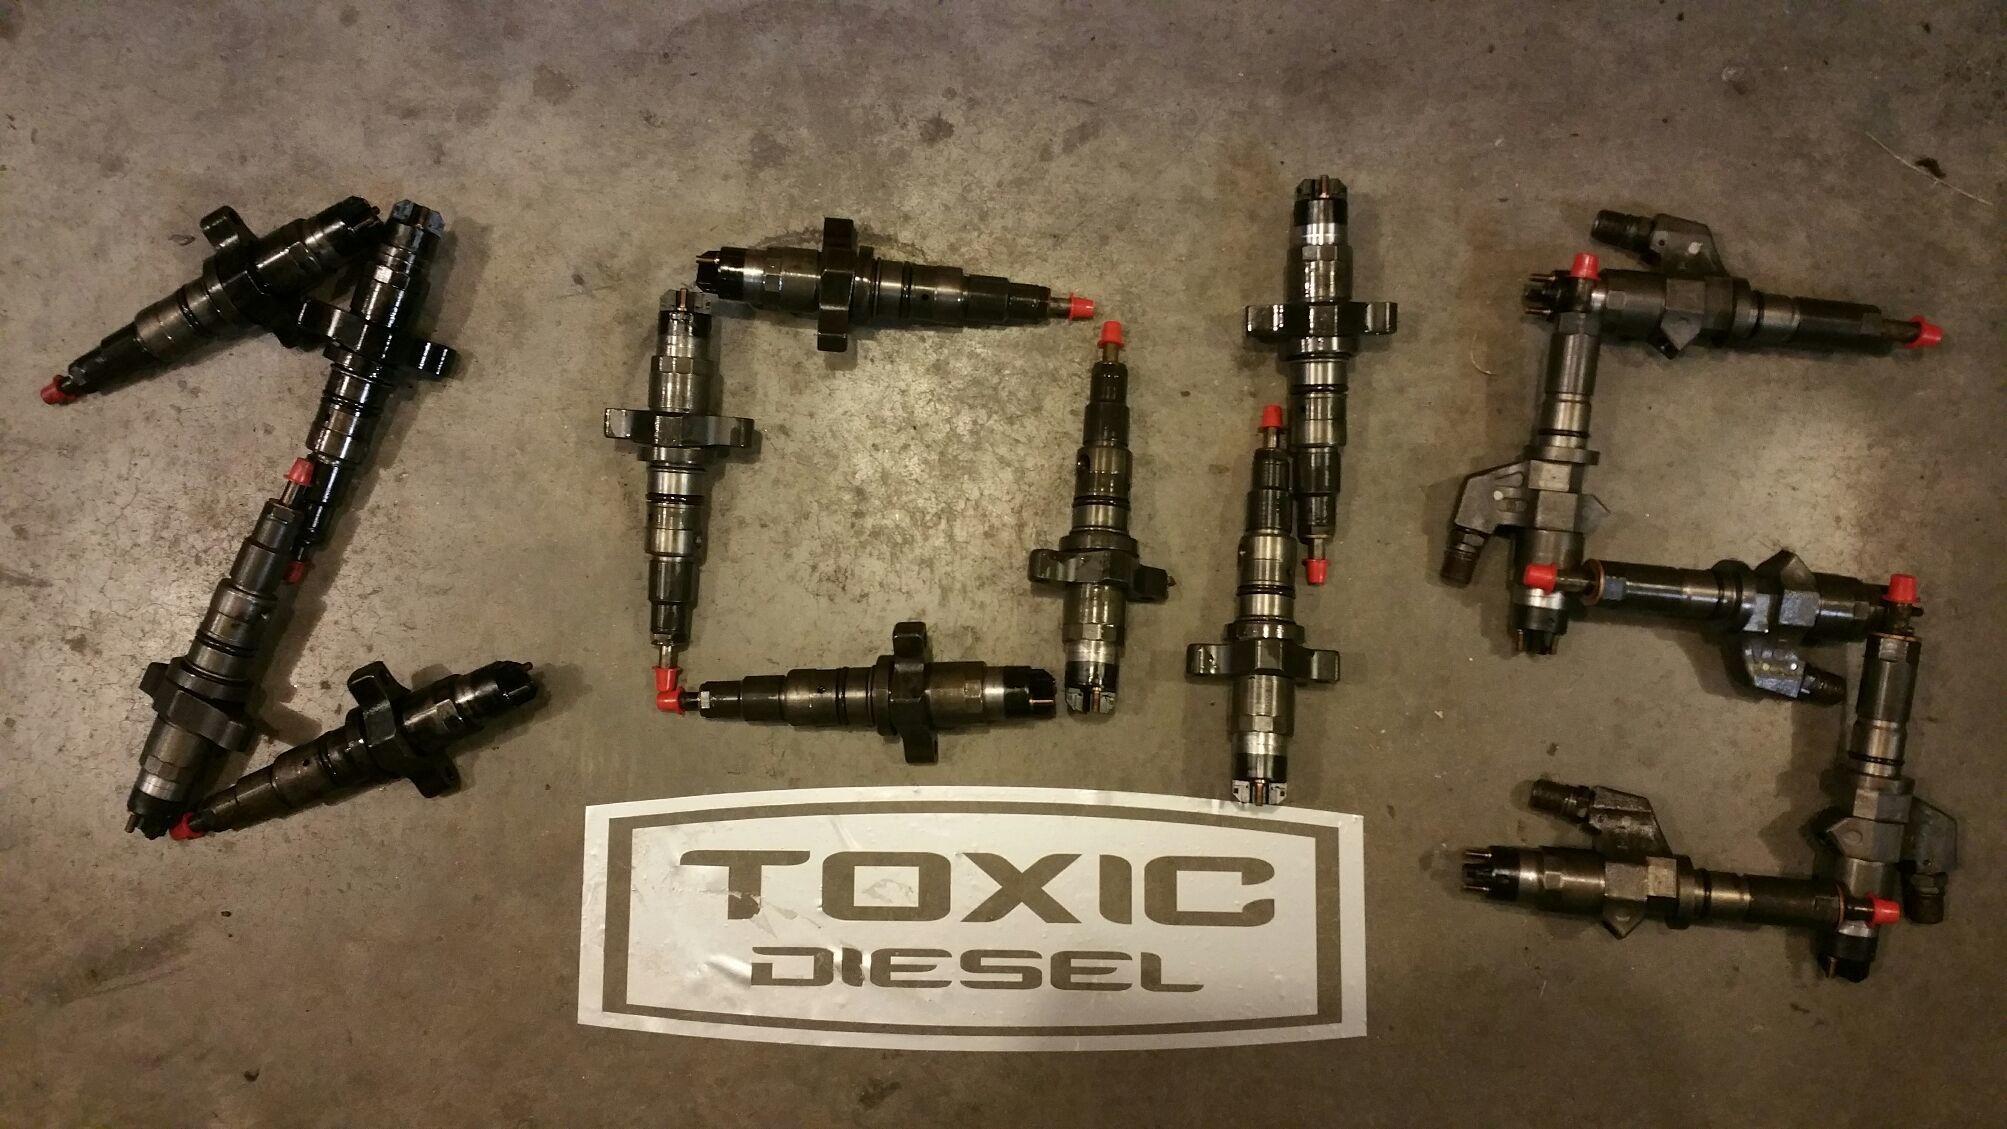 Happy 2015 Toxic Diesel Performance Fans www.toxicdiesel.com